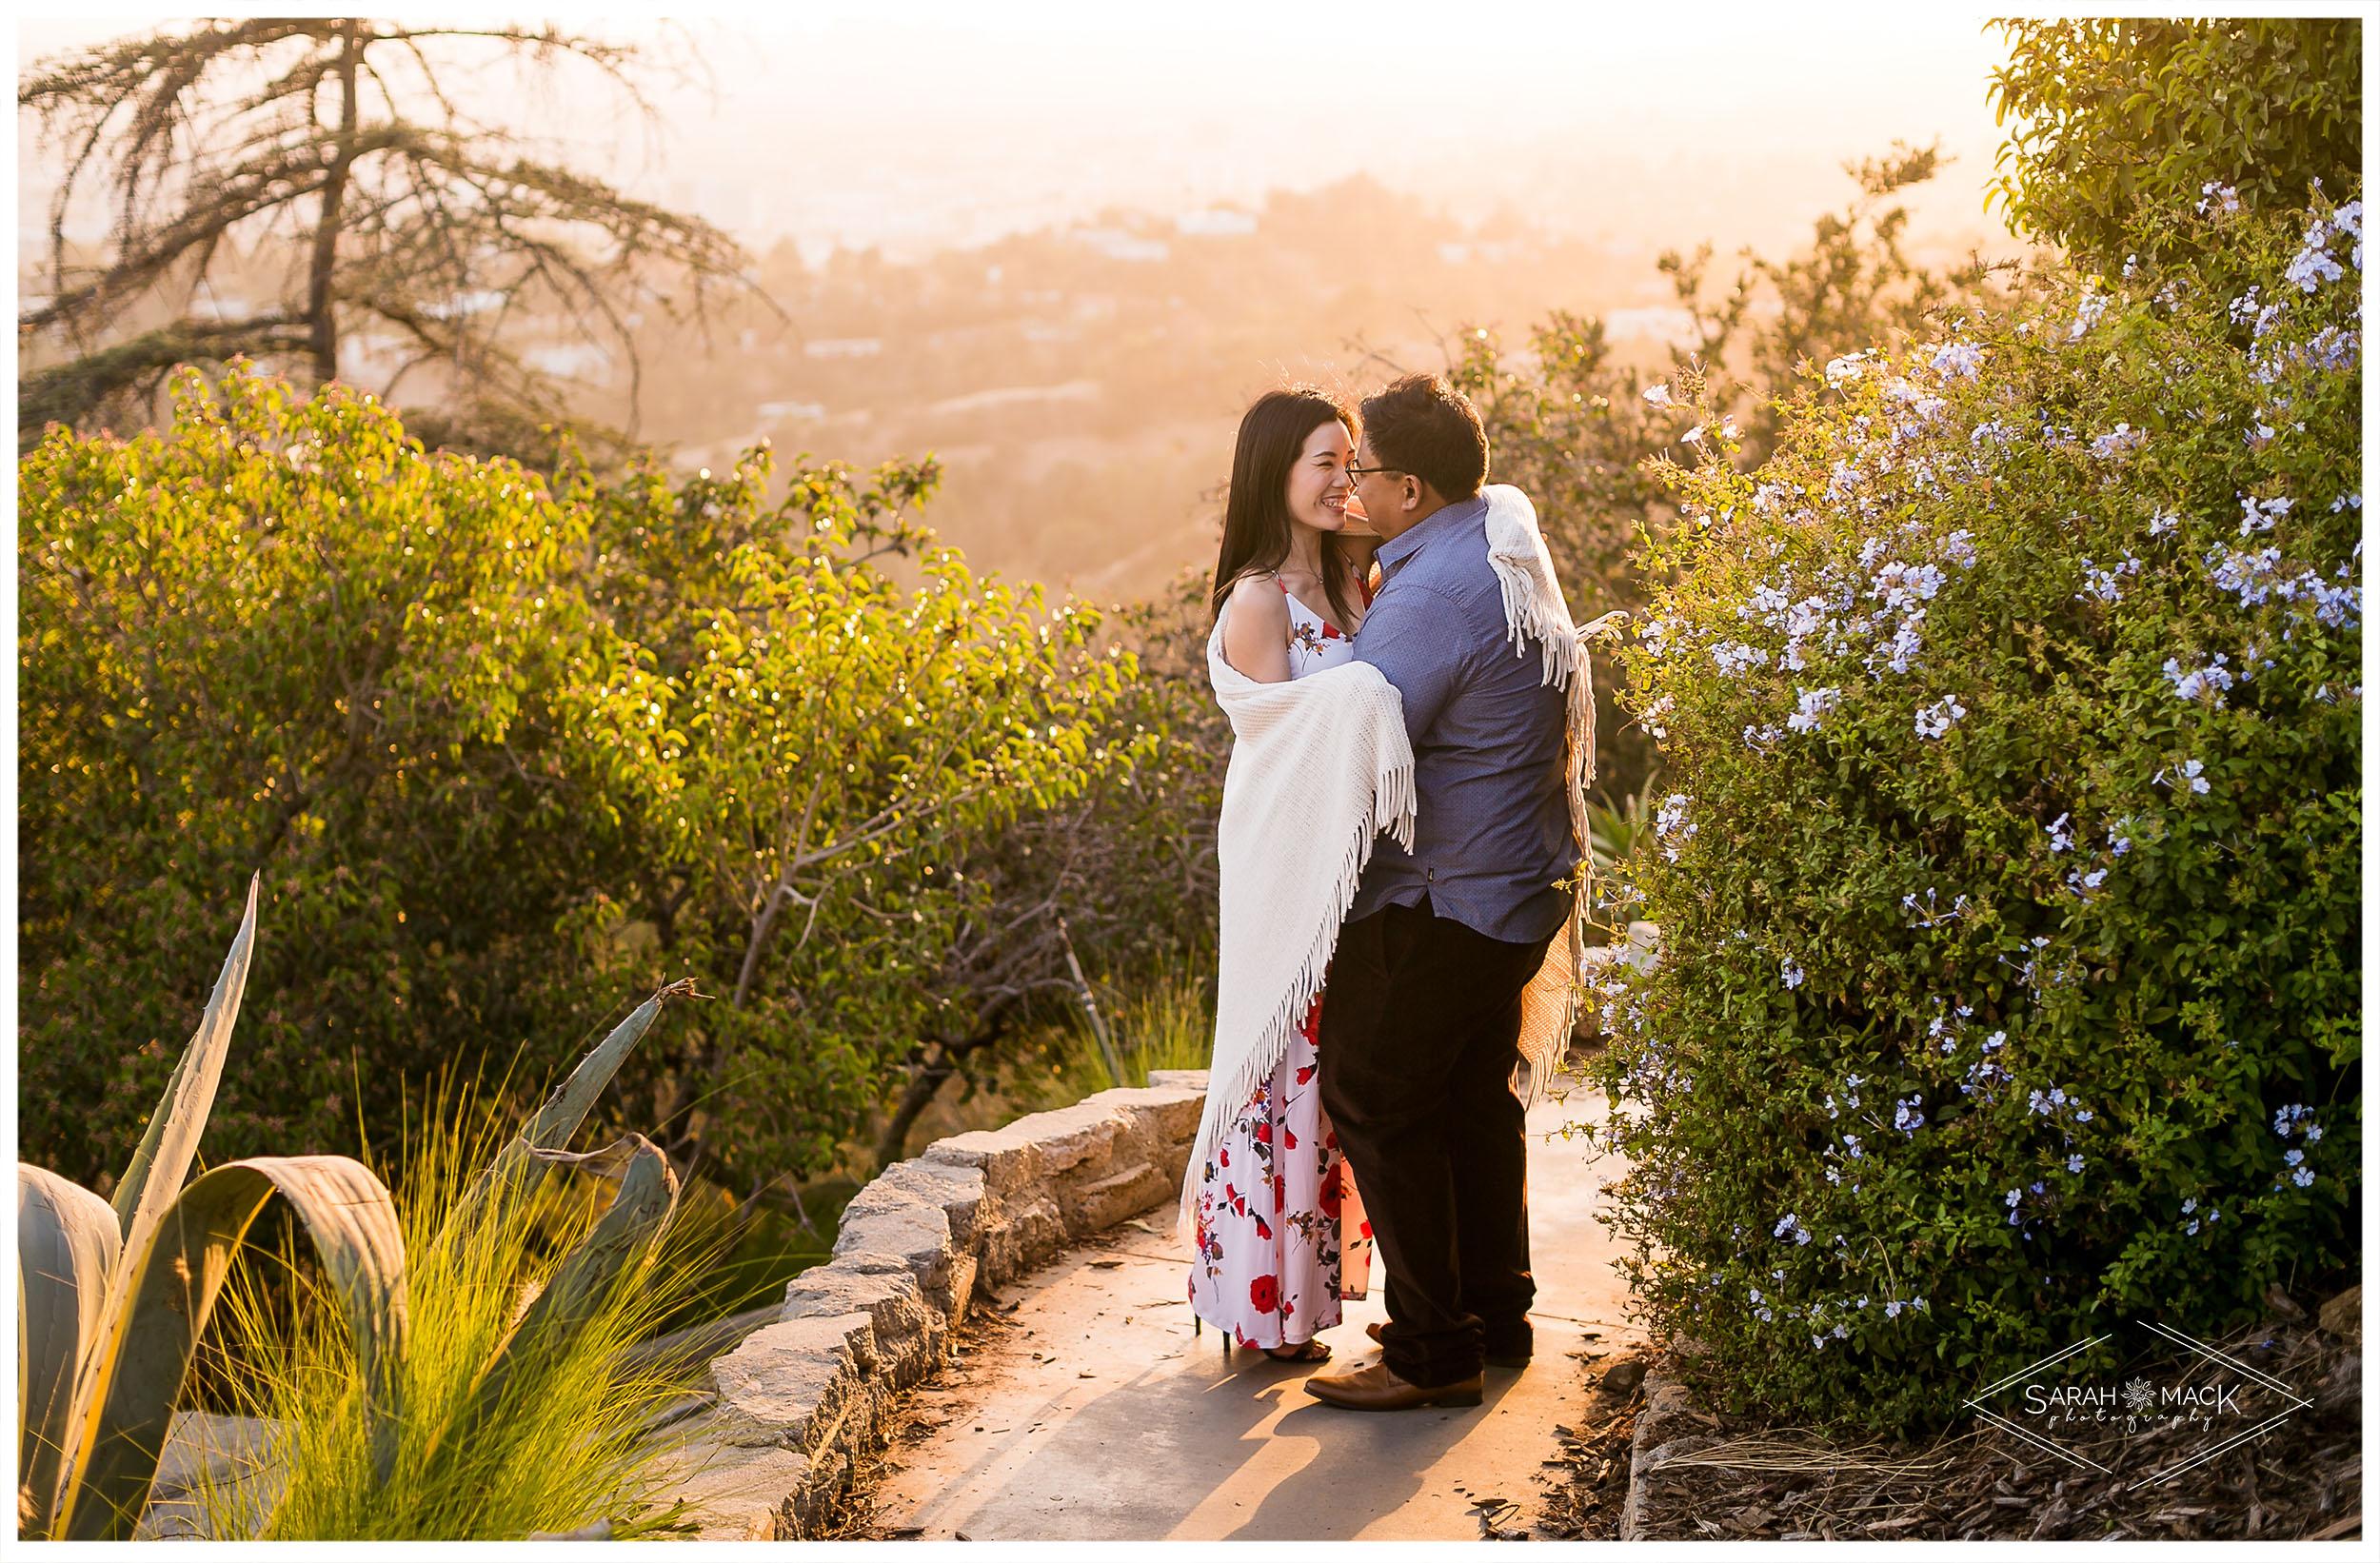 CM-Pasadena-City-Hall-Engagement-17.jpg